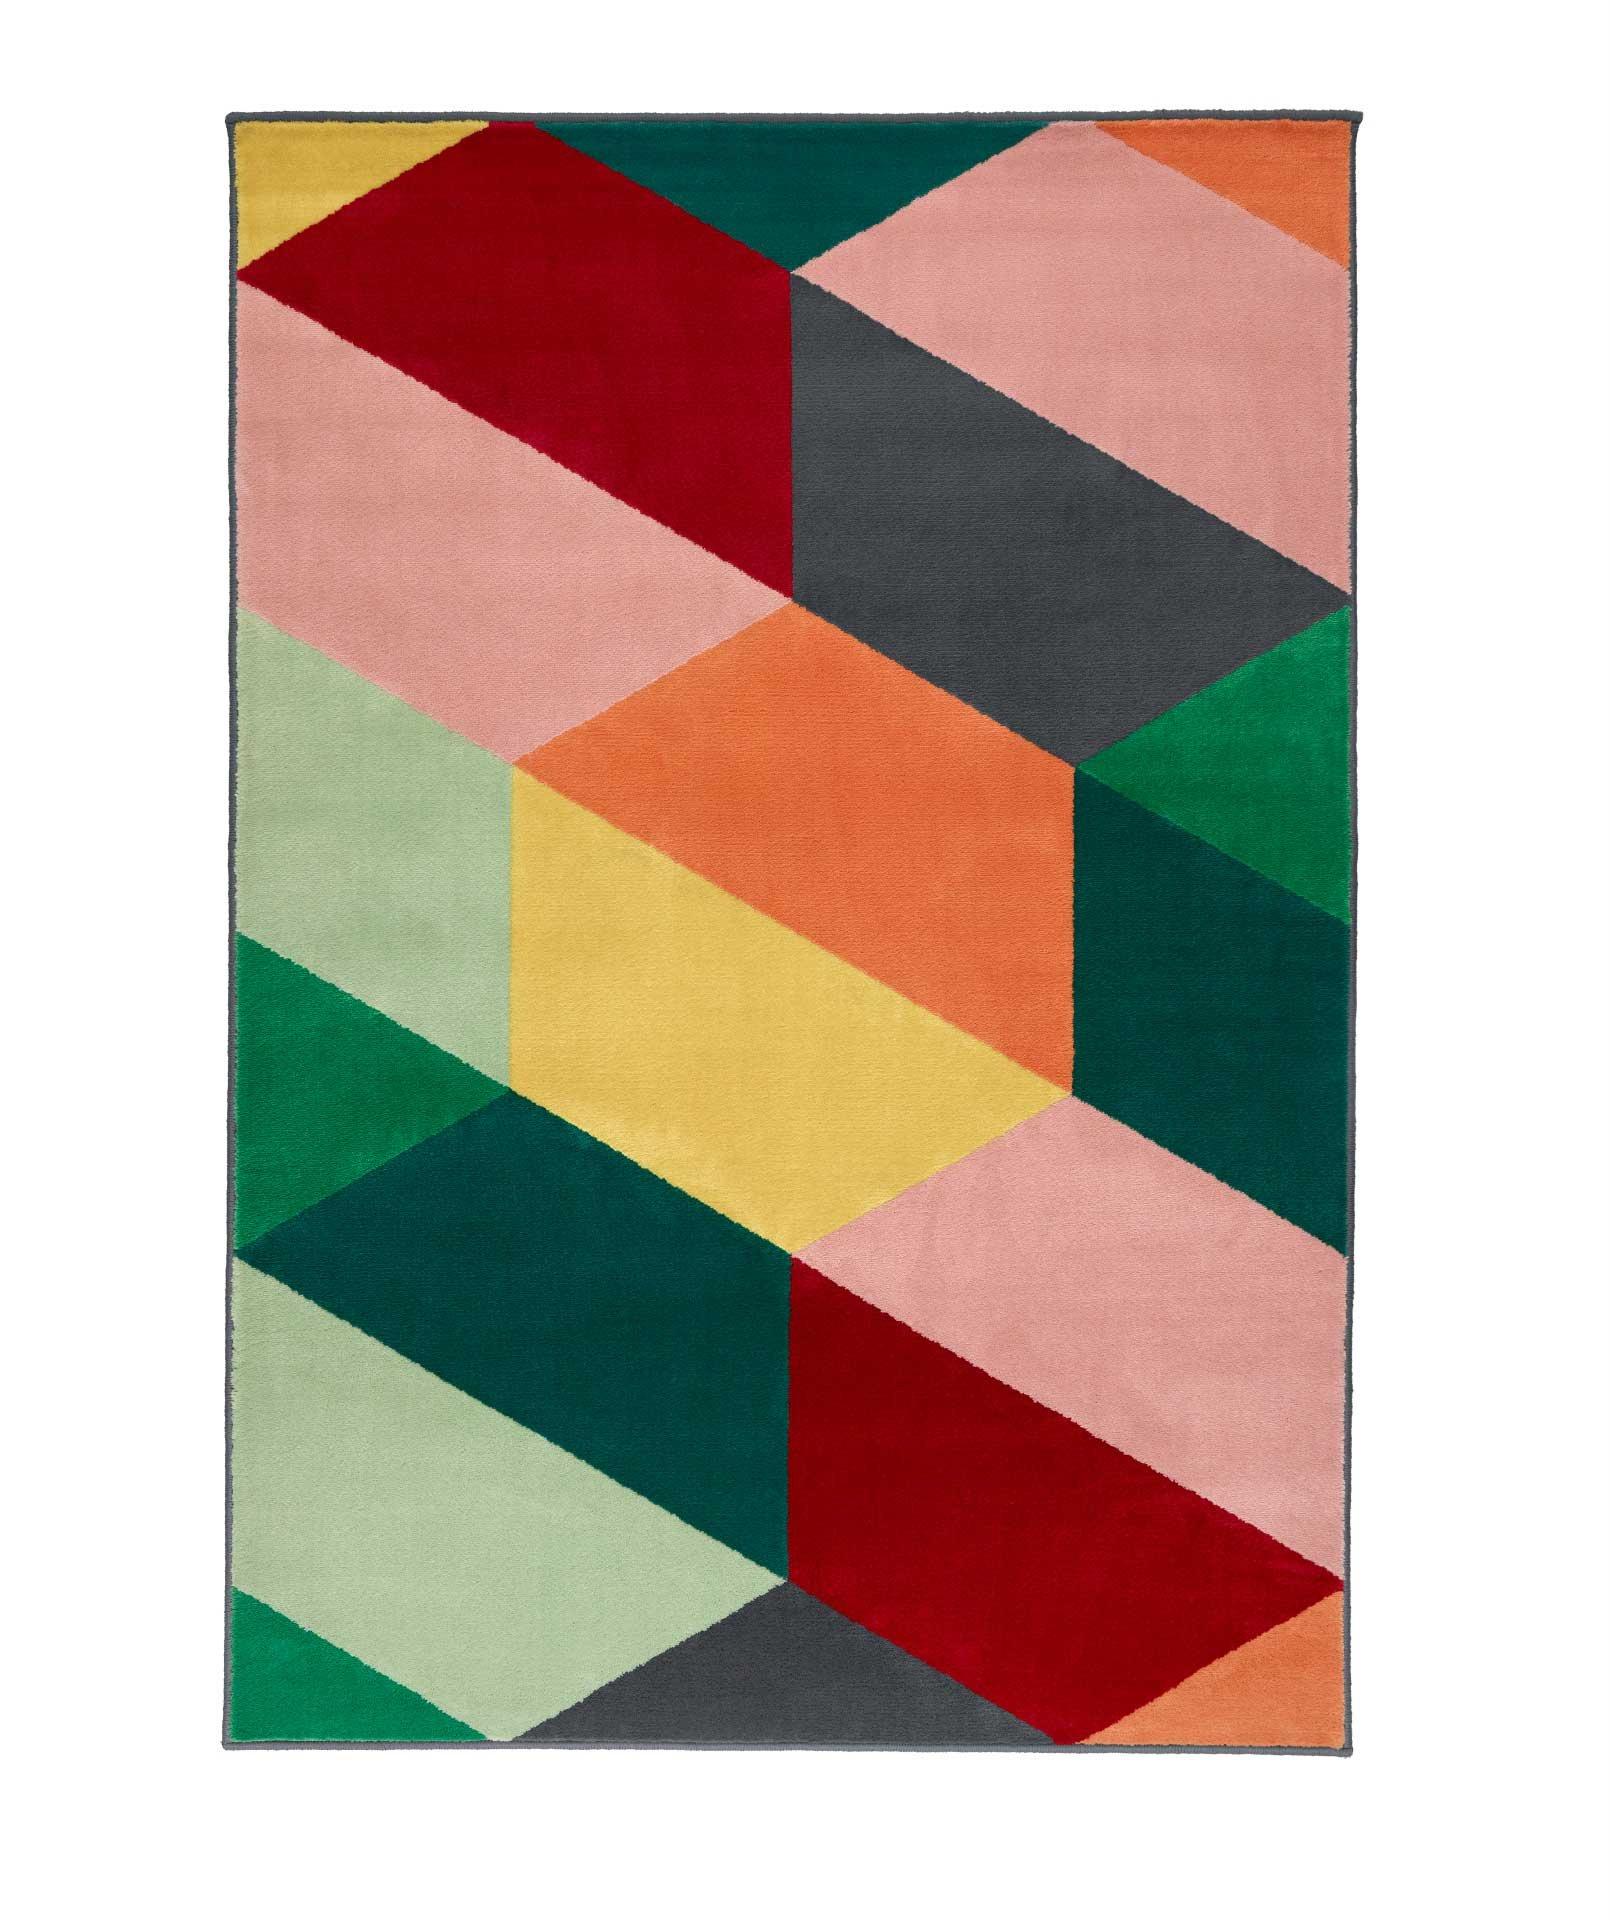 Tappeti di design opere d arte per interni cose di casa for Ikea tappeti persiani